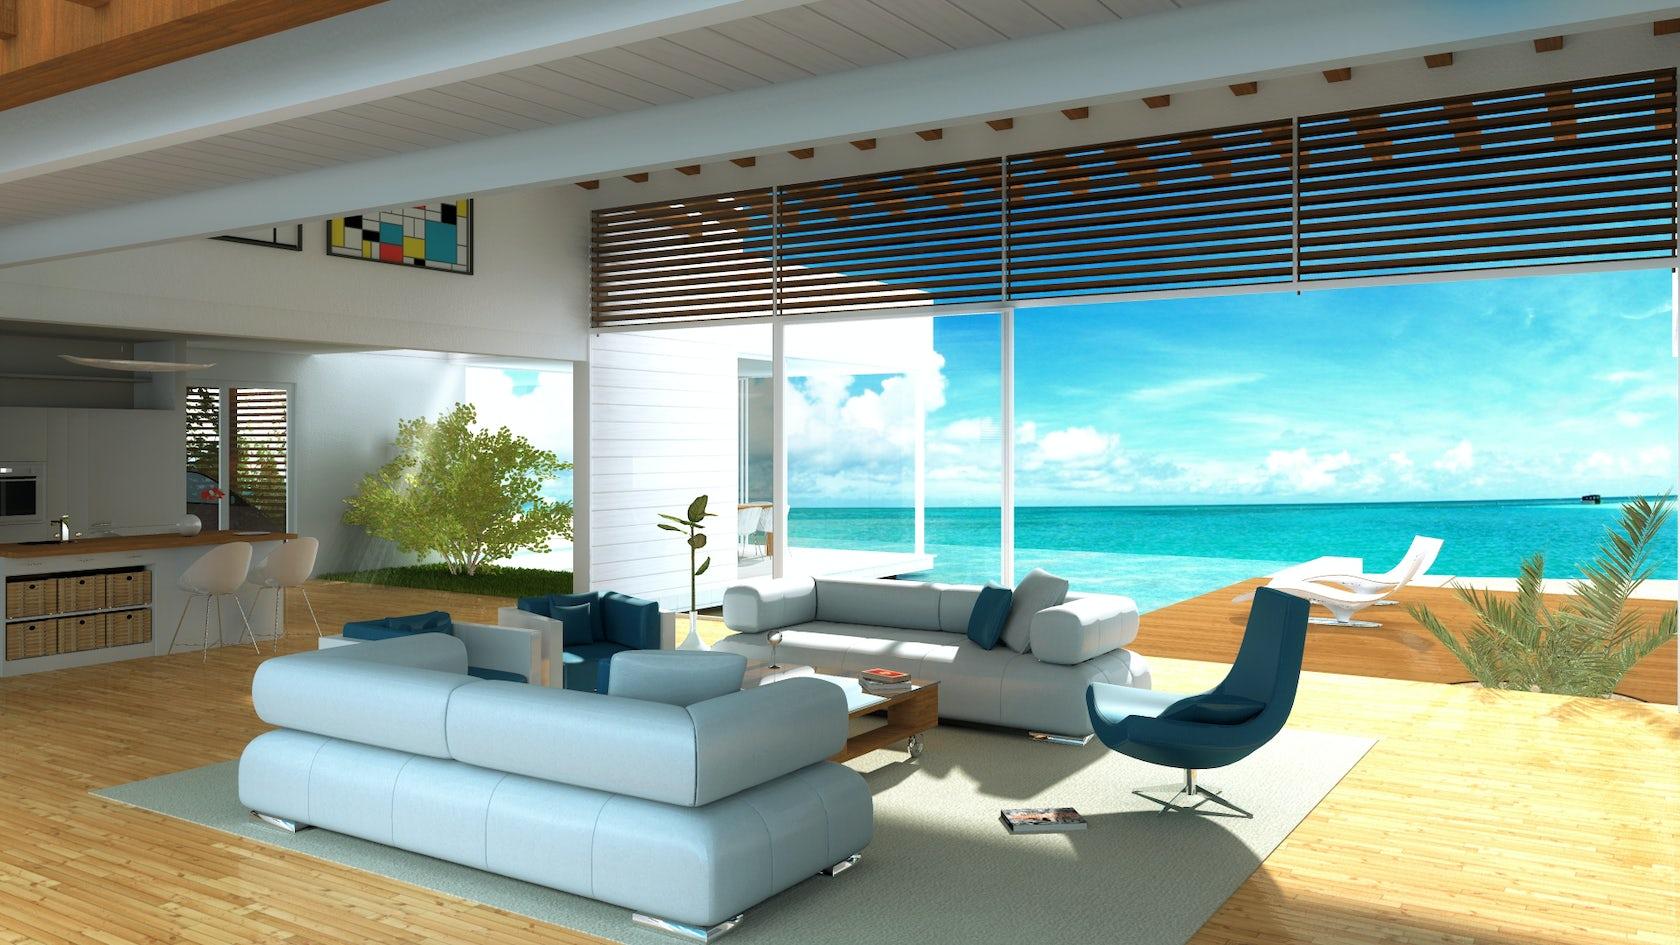 beach villa green island republic architizer. Black Bedroom Furniture Sets. Home Design Ideas